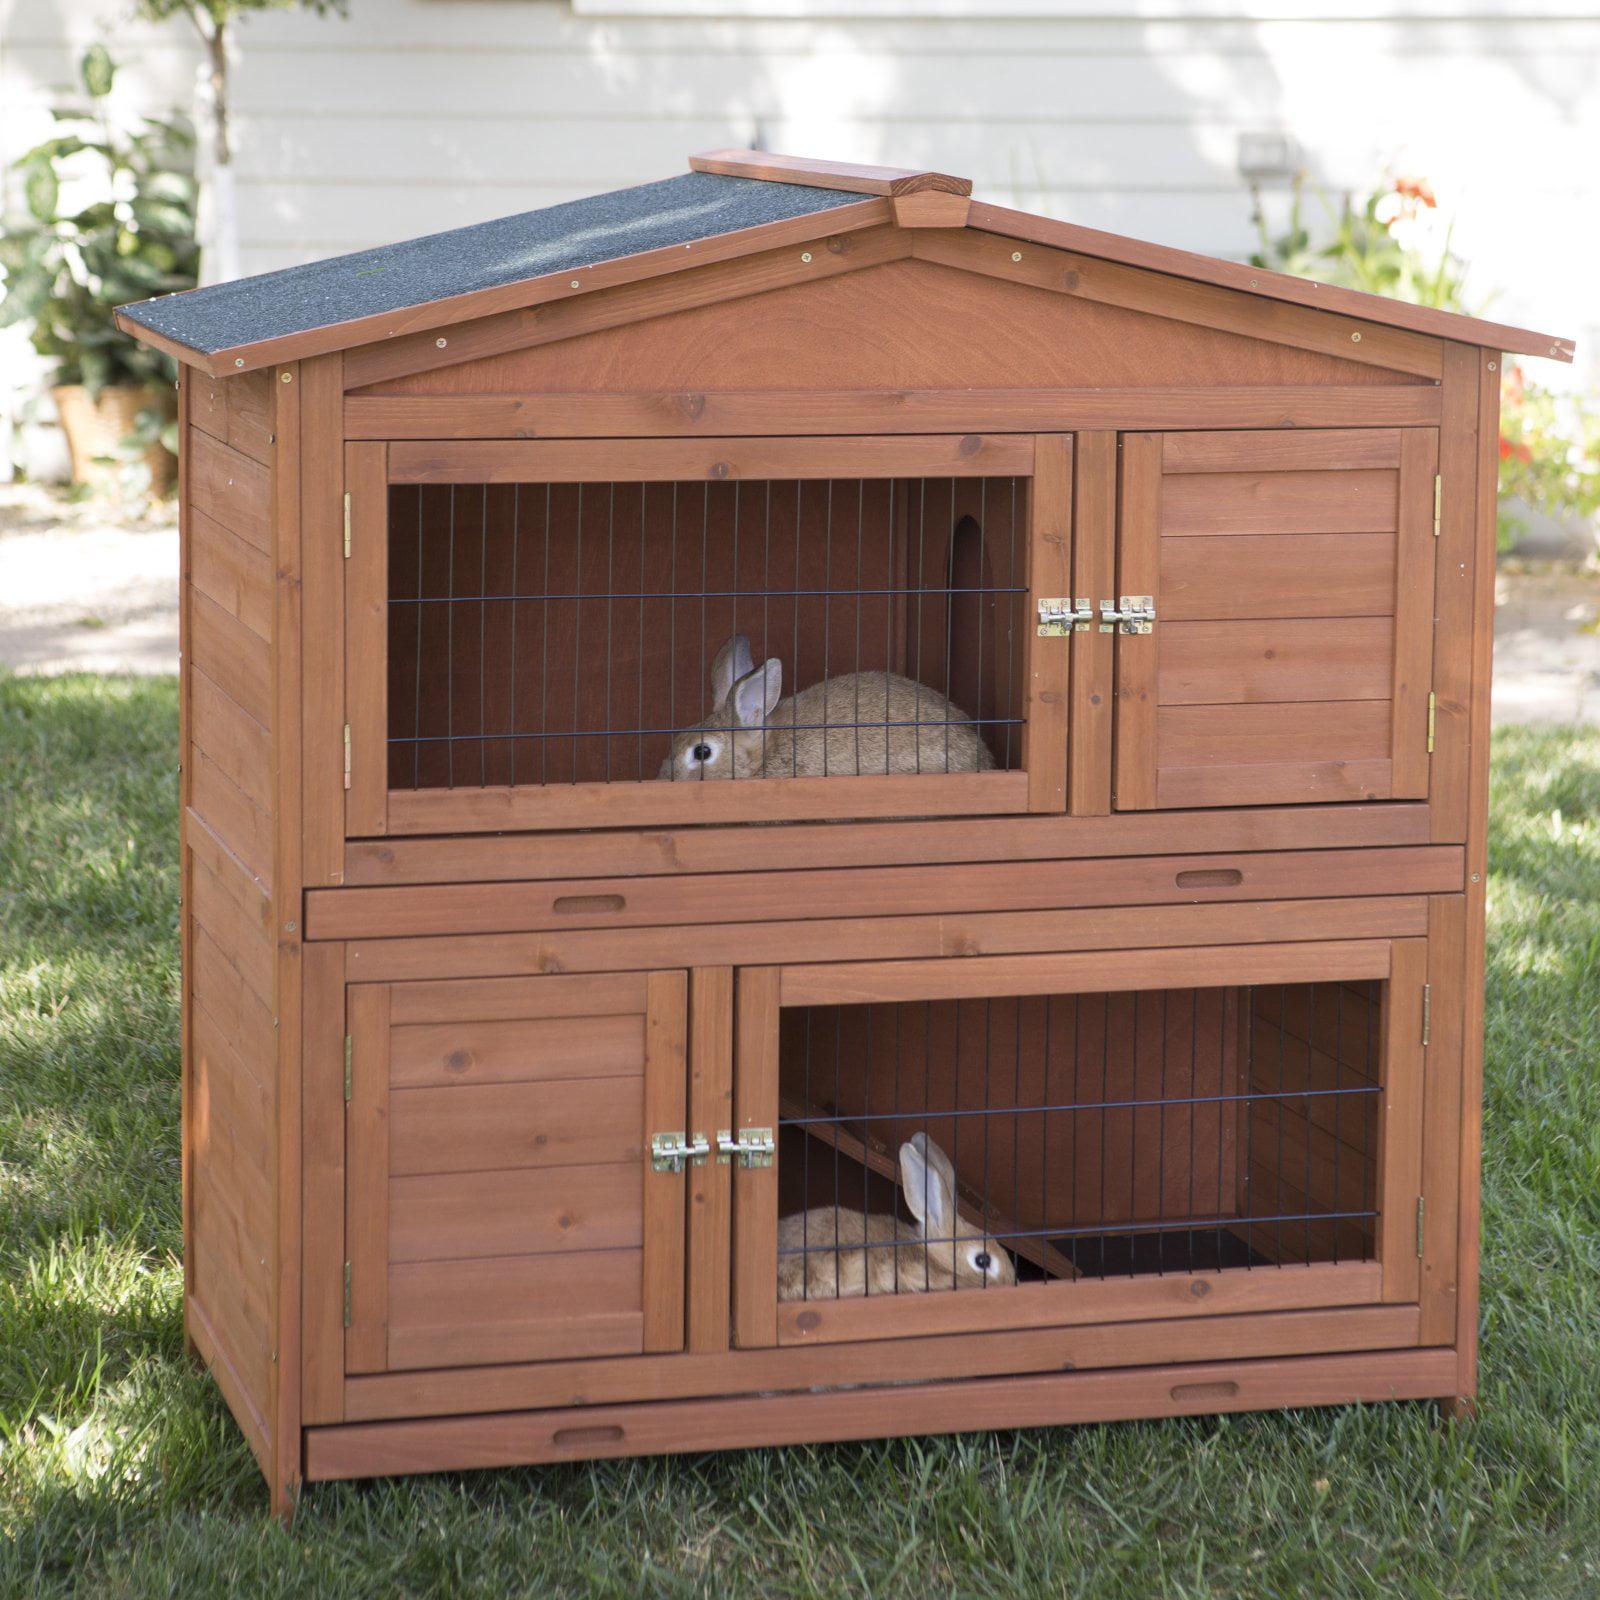 Boomer & George Double-Decker Rabbit Hutch by